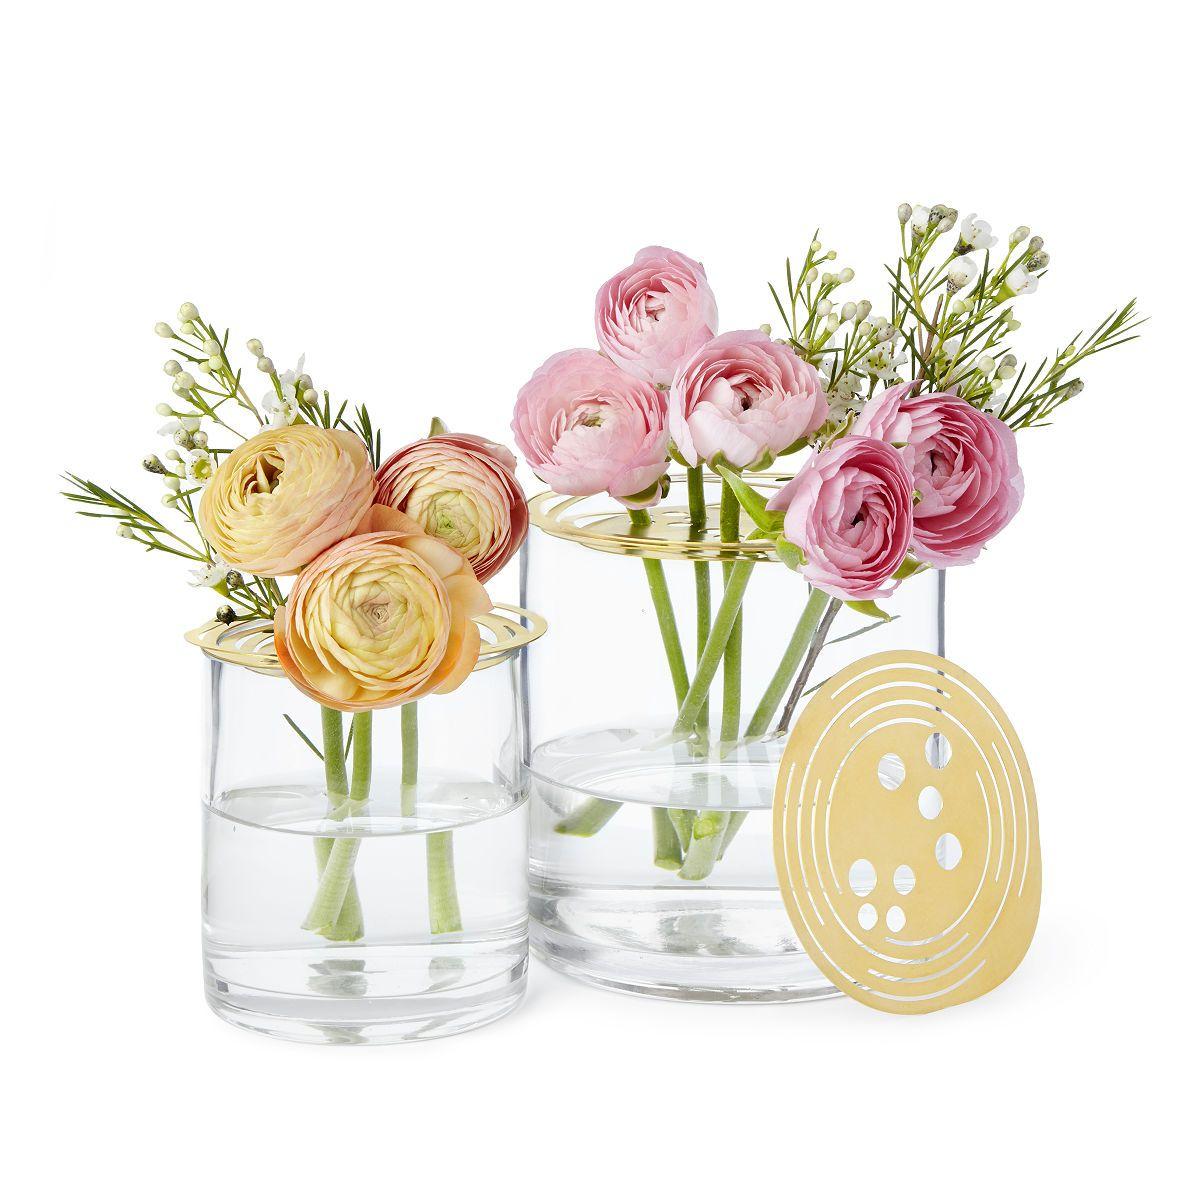 Zodiac Constellation Vase Topper | Zodiac Decor, Flower Frog, Astrology Decor | Astrology decor ...